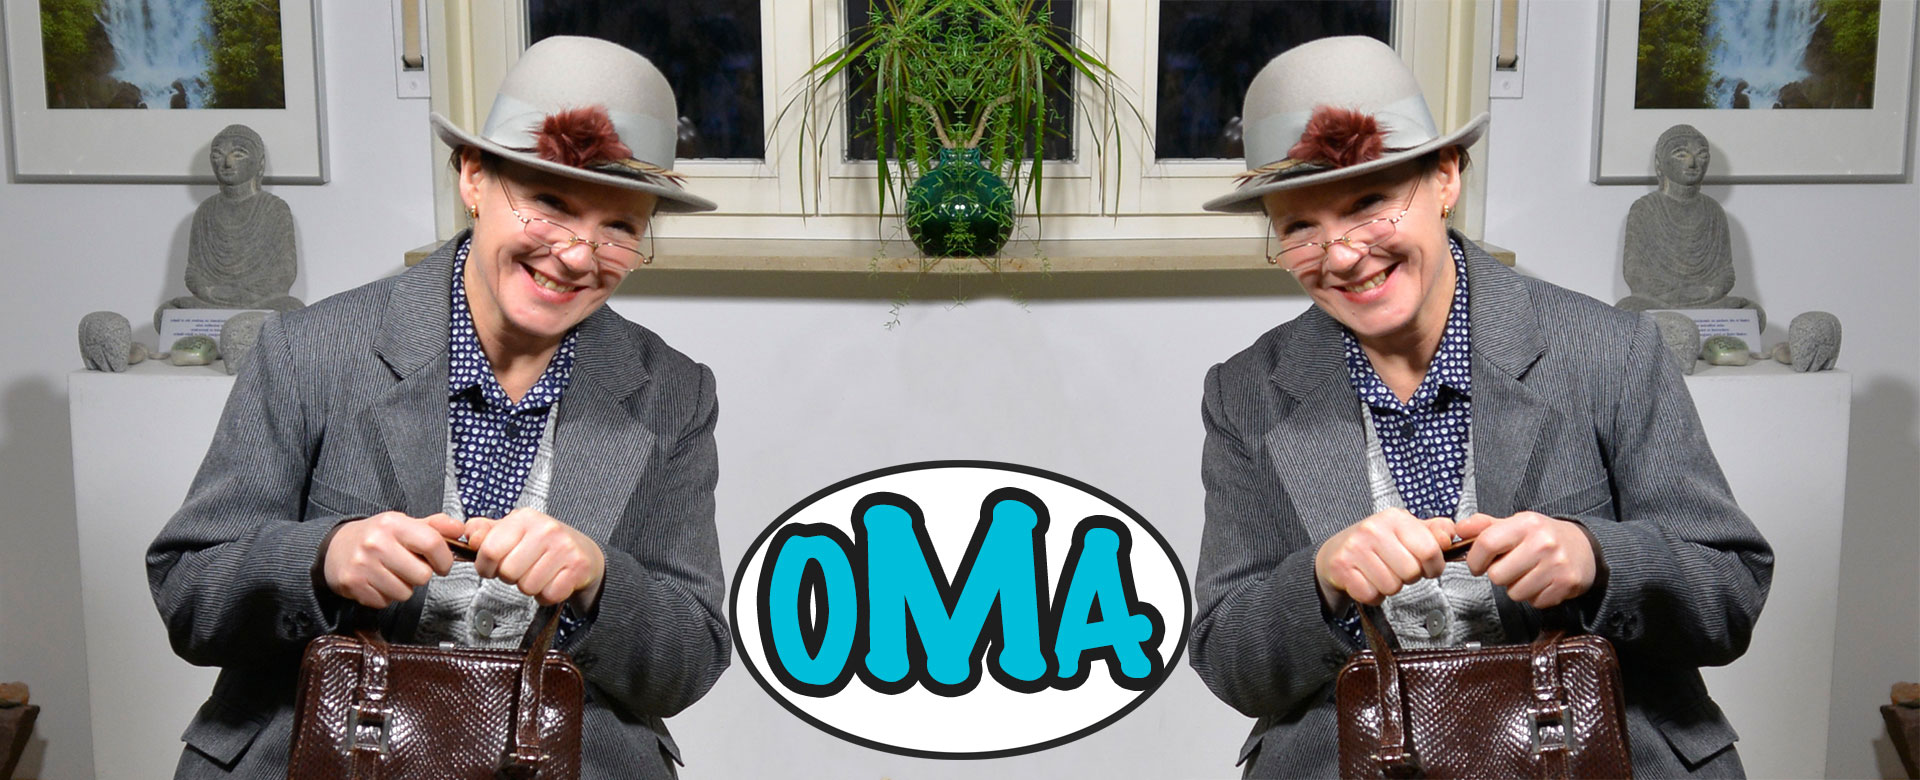 Kinderprogramm Esslingen Oma aus Oklahoma